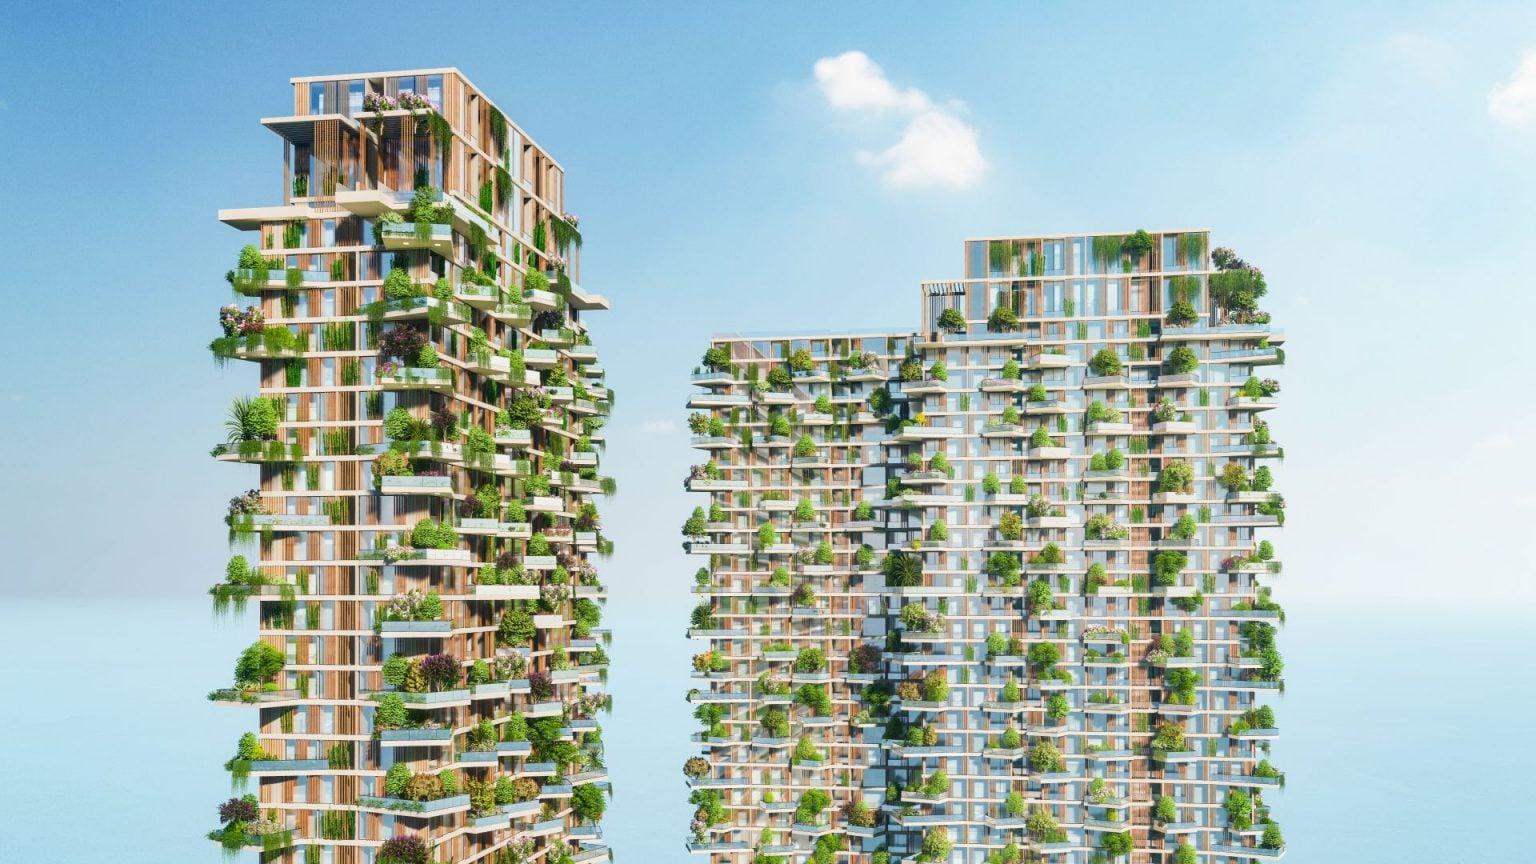 Vietnam tallest vertical forest tower